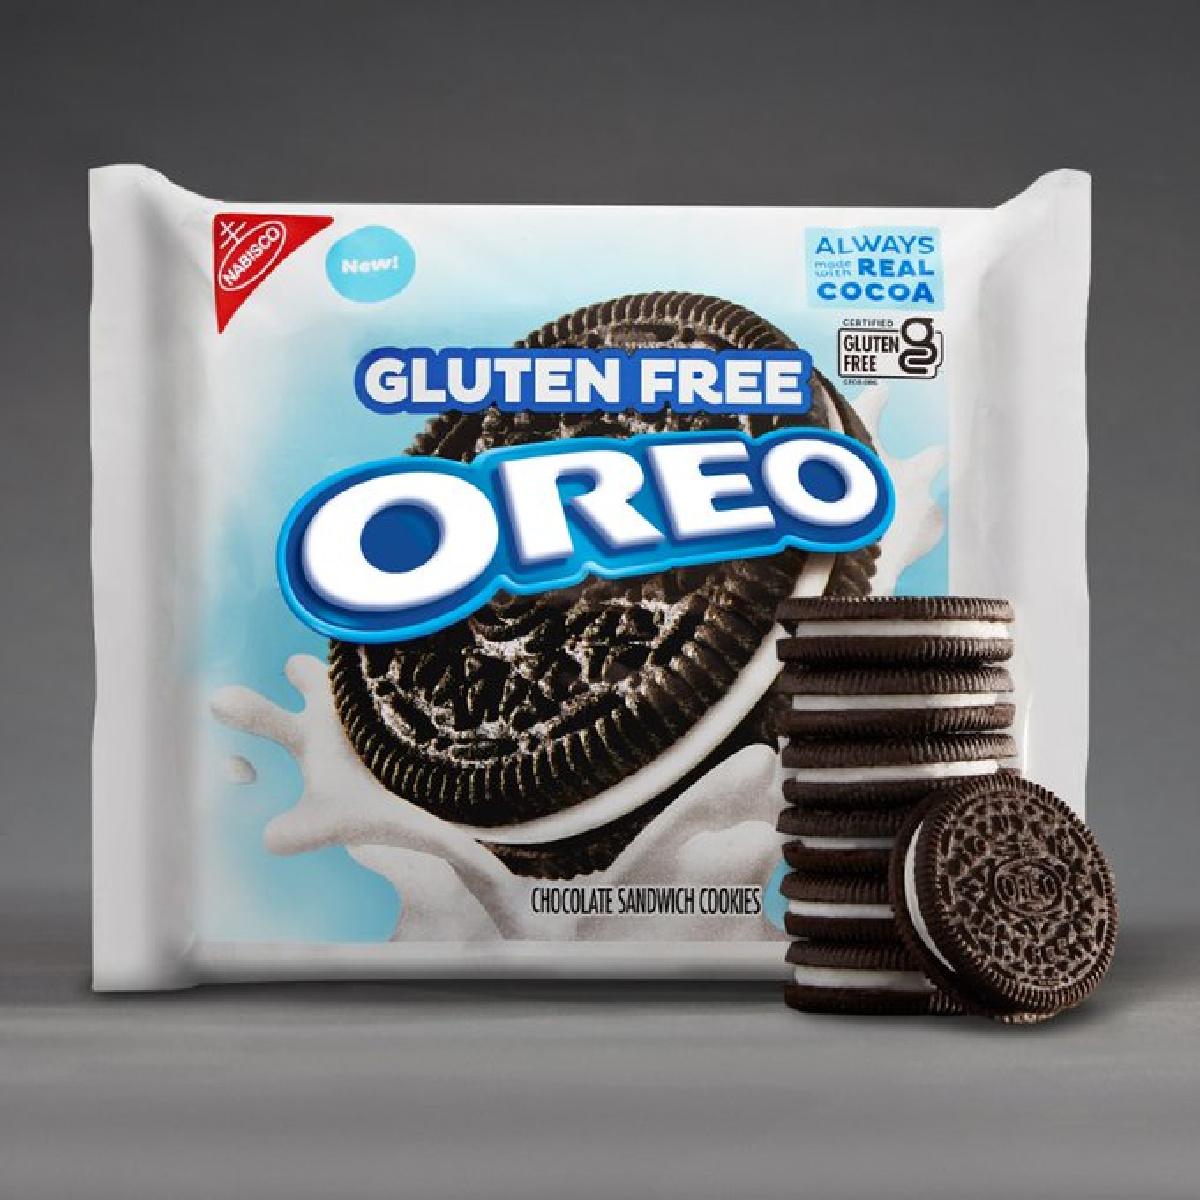 Gluten Free Oreos coming soon!